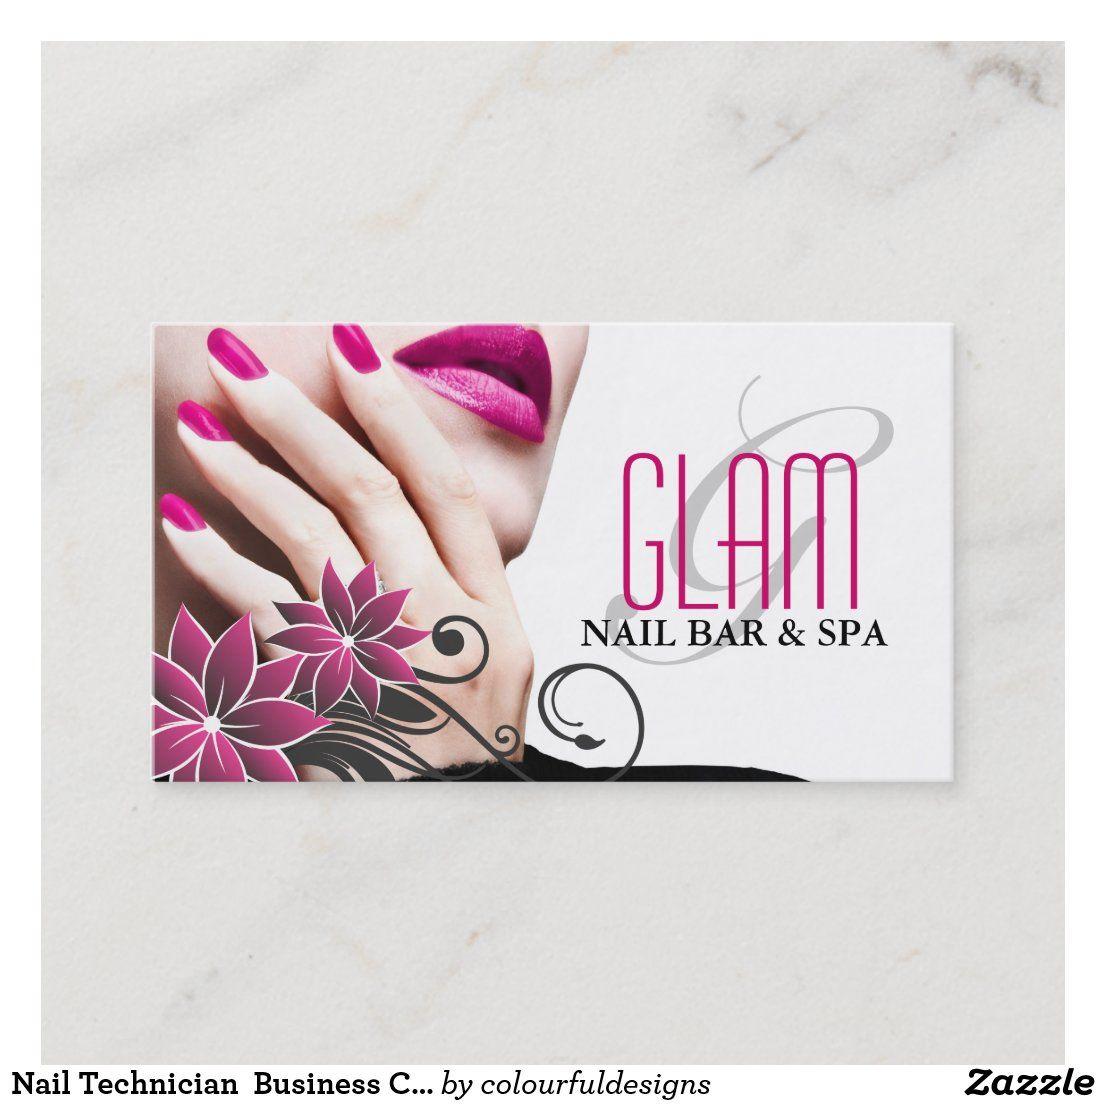 Nail Technician Business Card Zazzle Com In 2021 Nail Salon Business Cards Nail Tech Business Cards Salon Business Cards